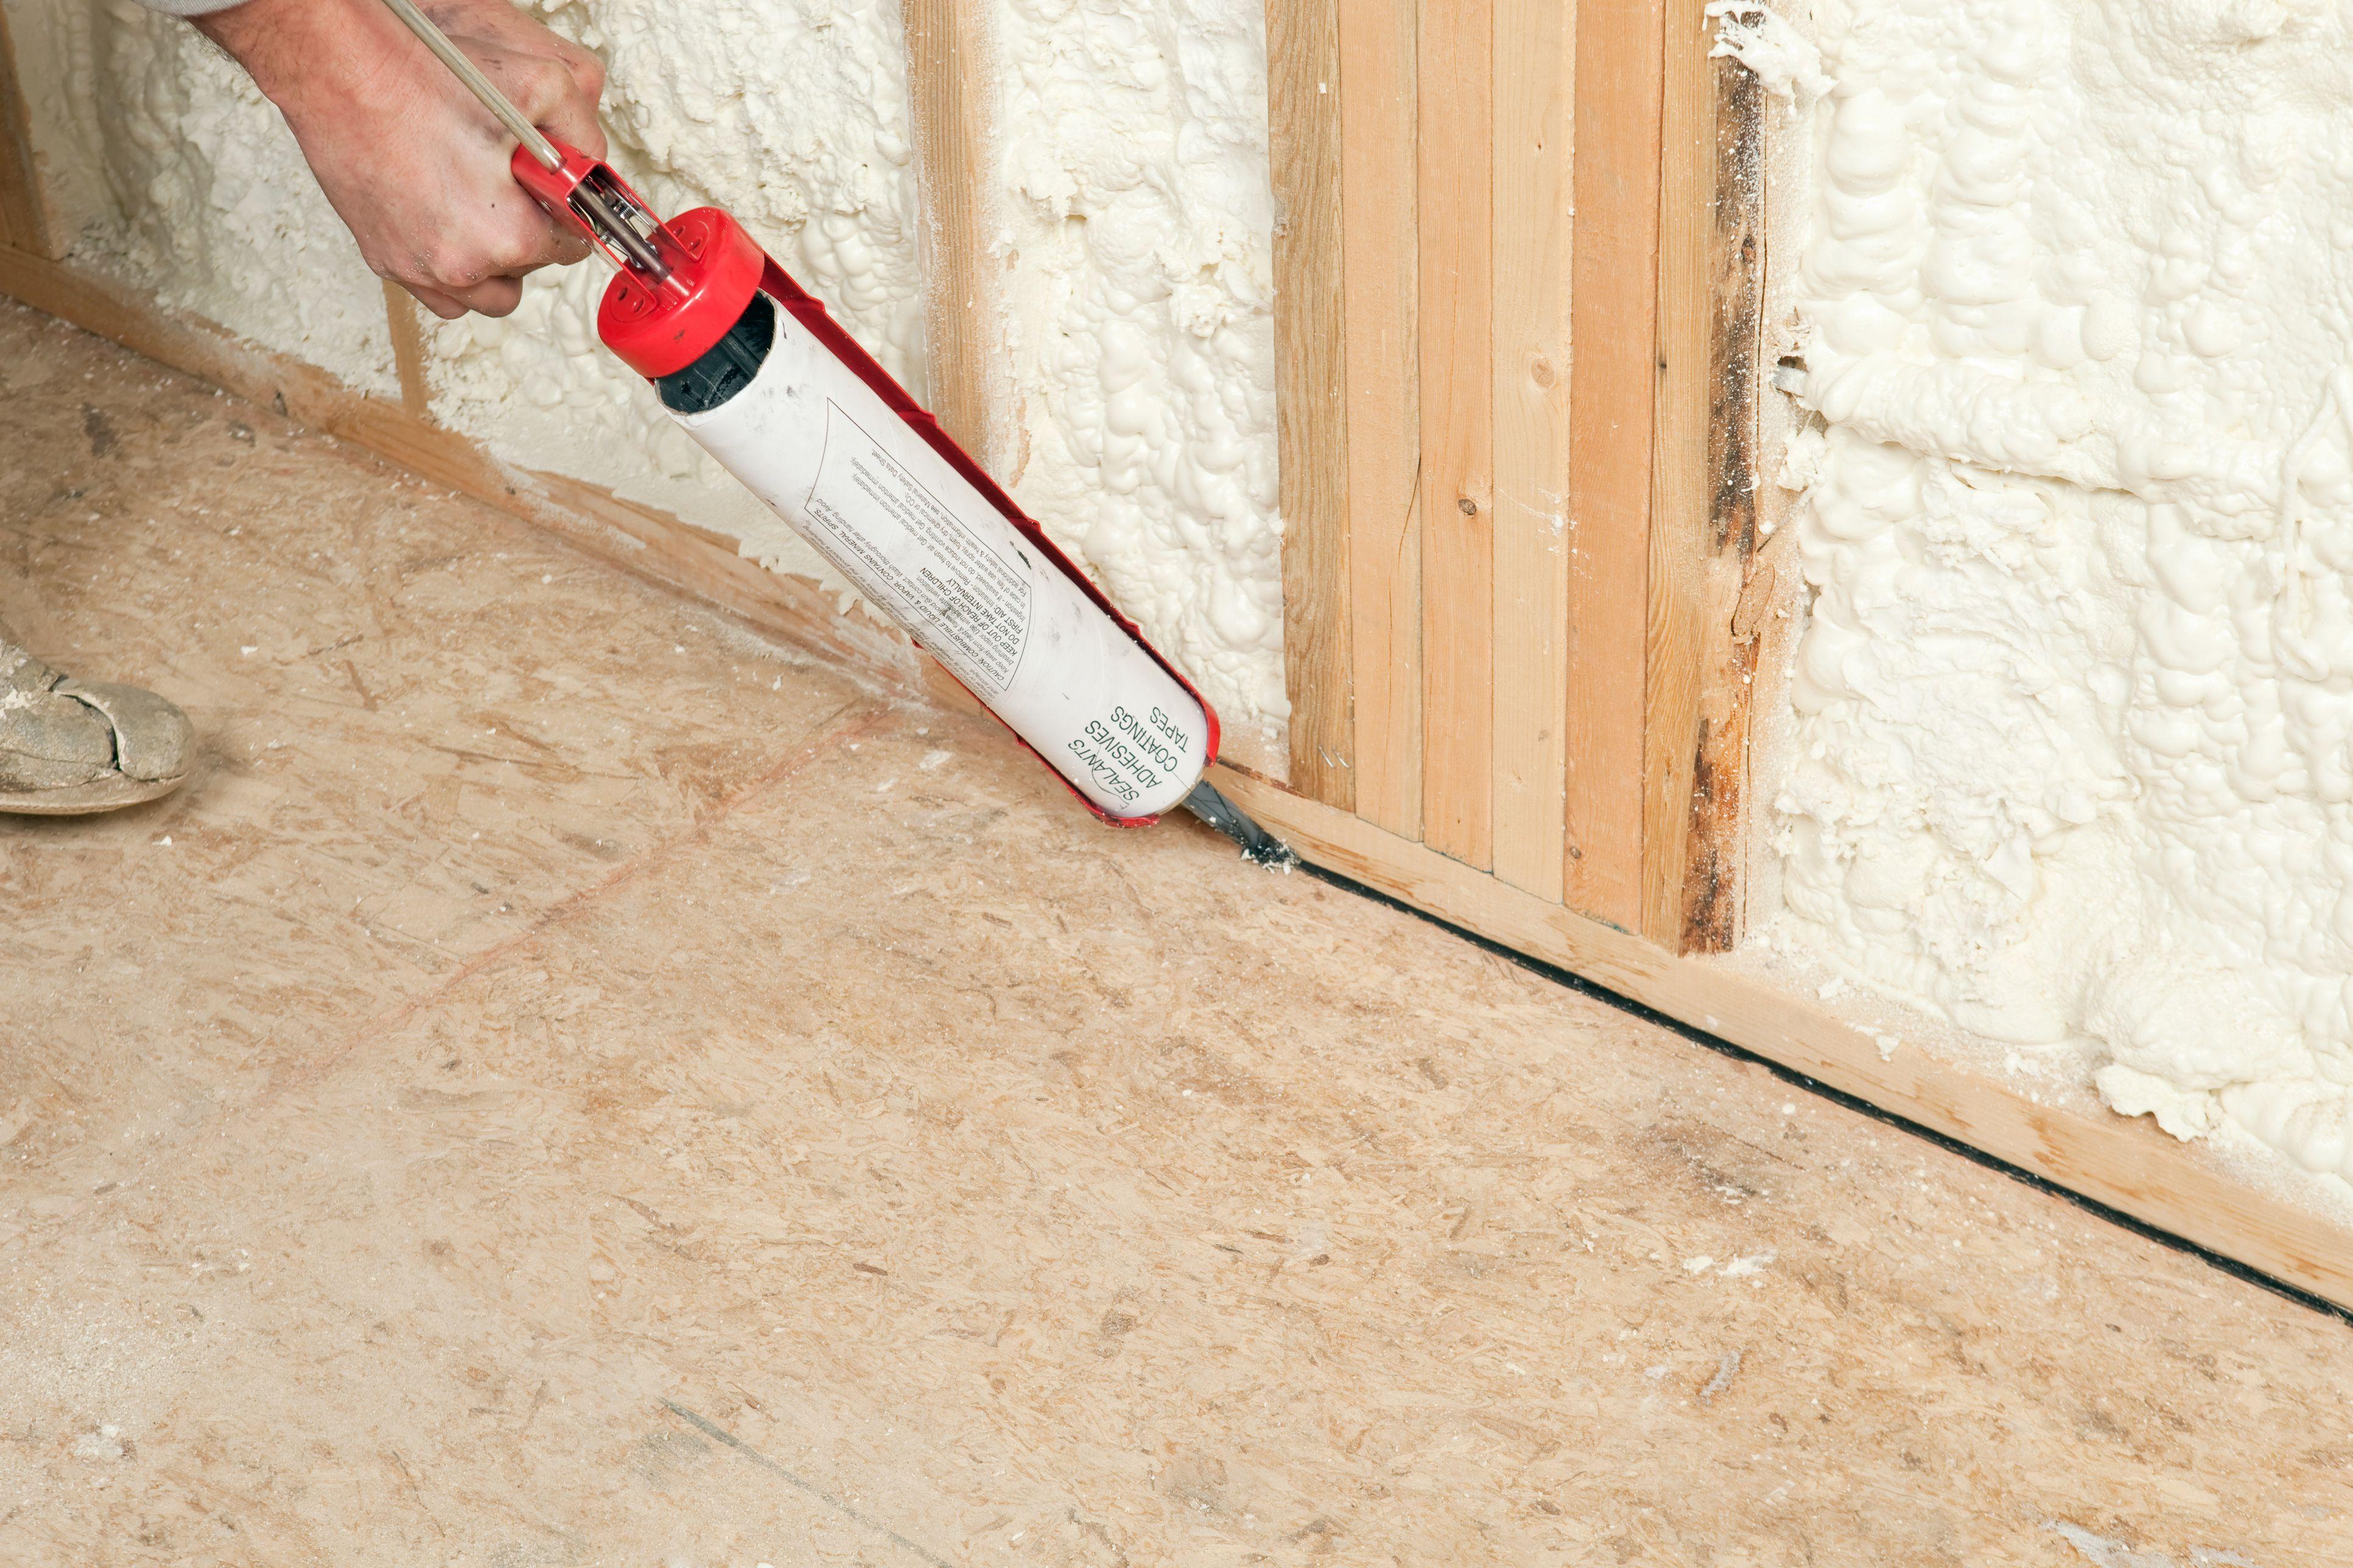 waxing hardwood floors yourself of osb oriented strand board sub flooring for worker caulking wall plate to subfloor 185099682 57fa64803df78c690f7666e2